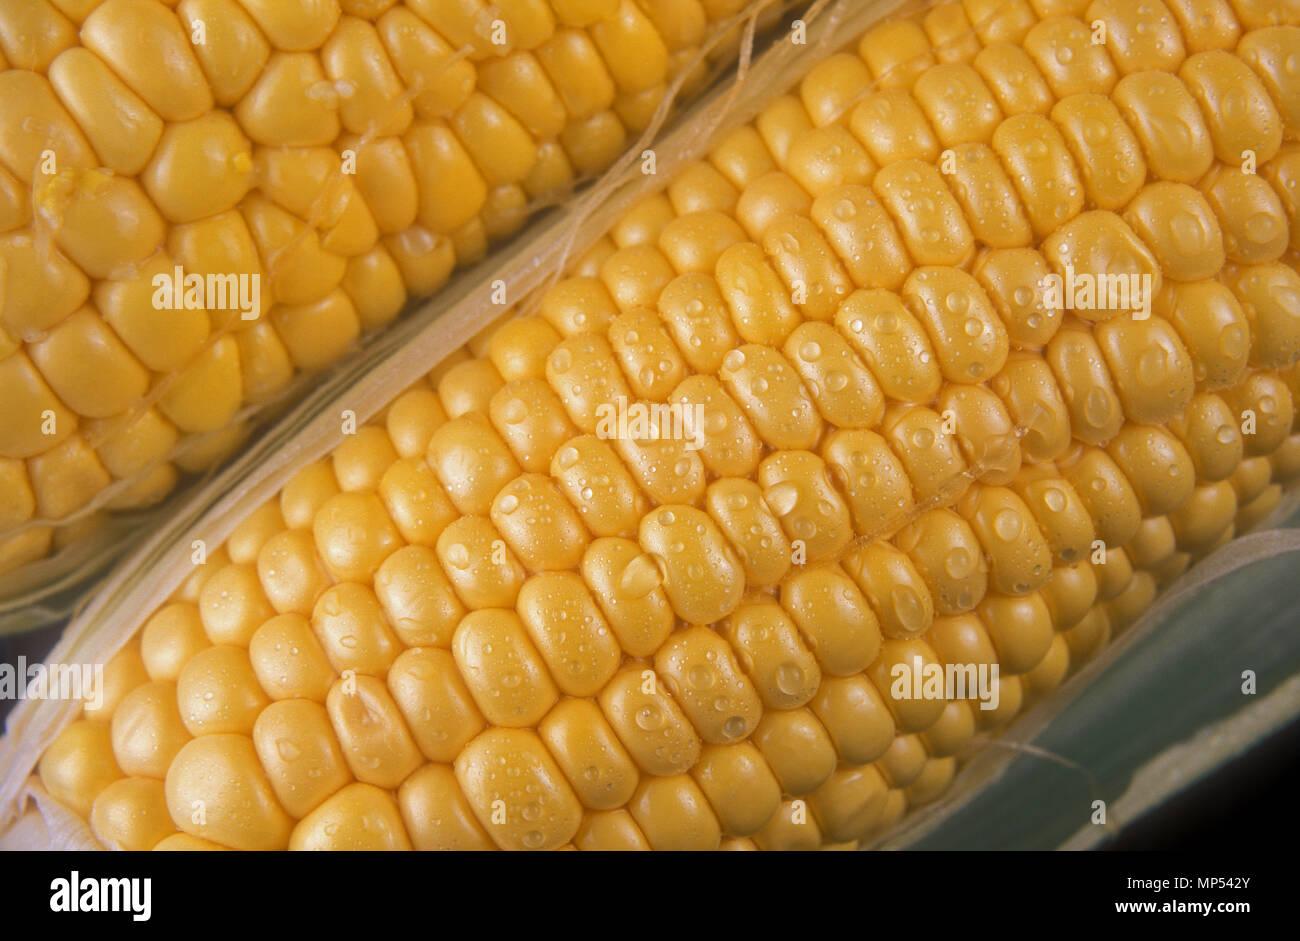 HARVESTED SWEET CORN (ZEA MAYS) - Stock Image